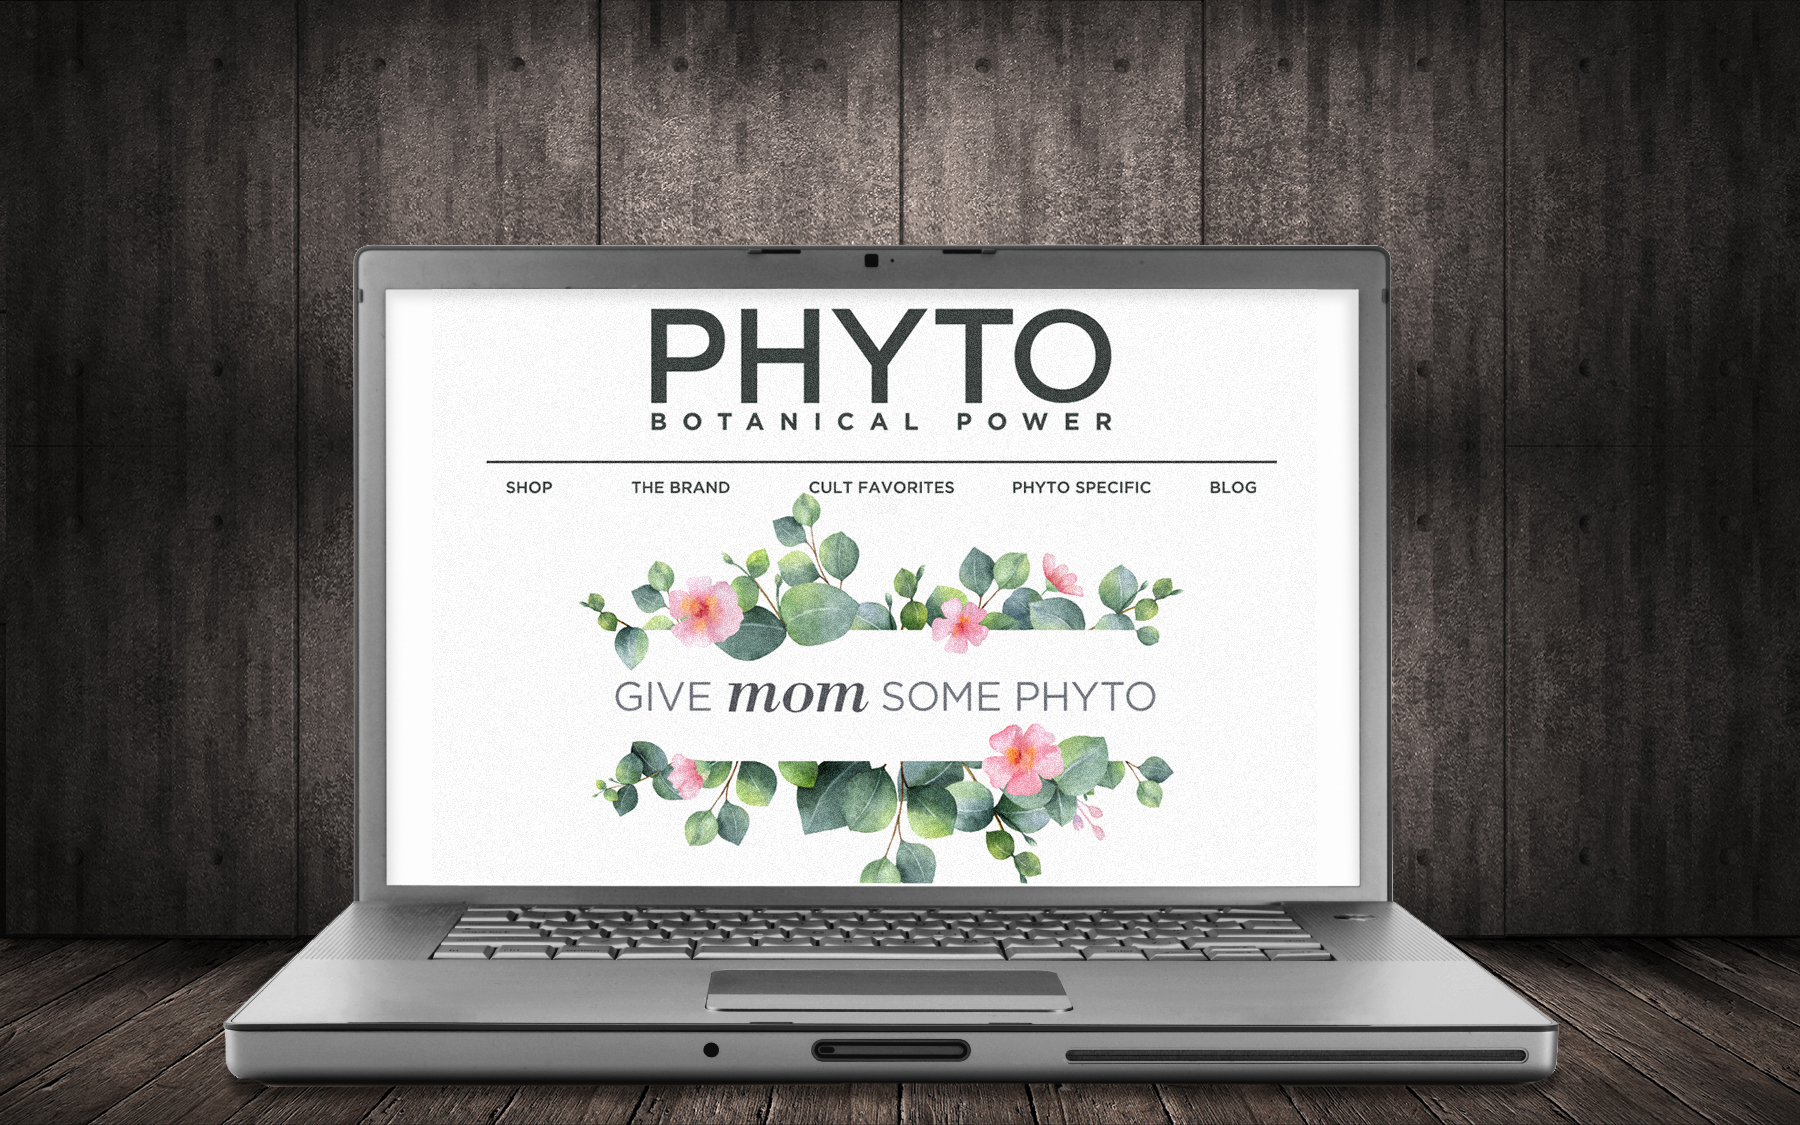 phyto3.jpg